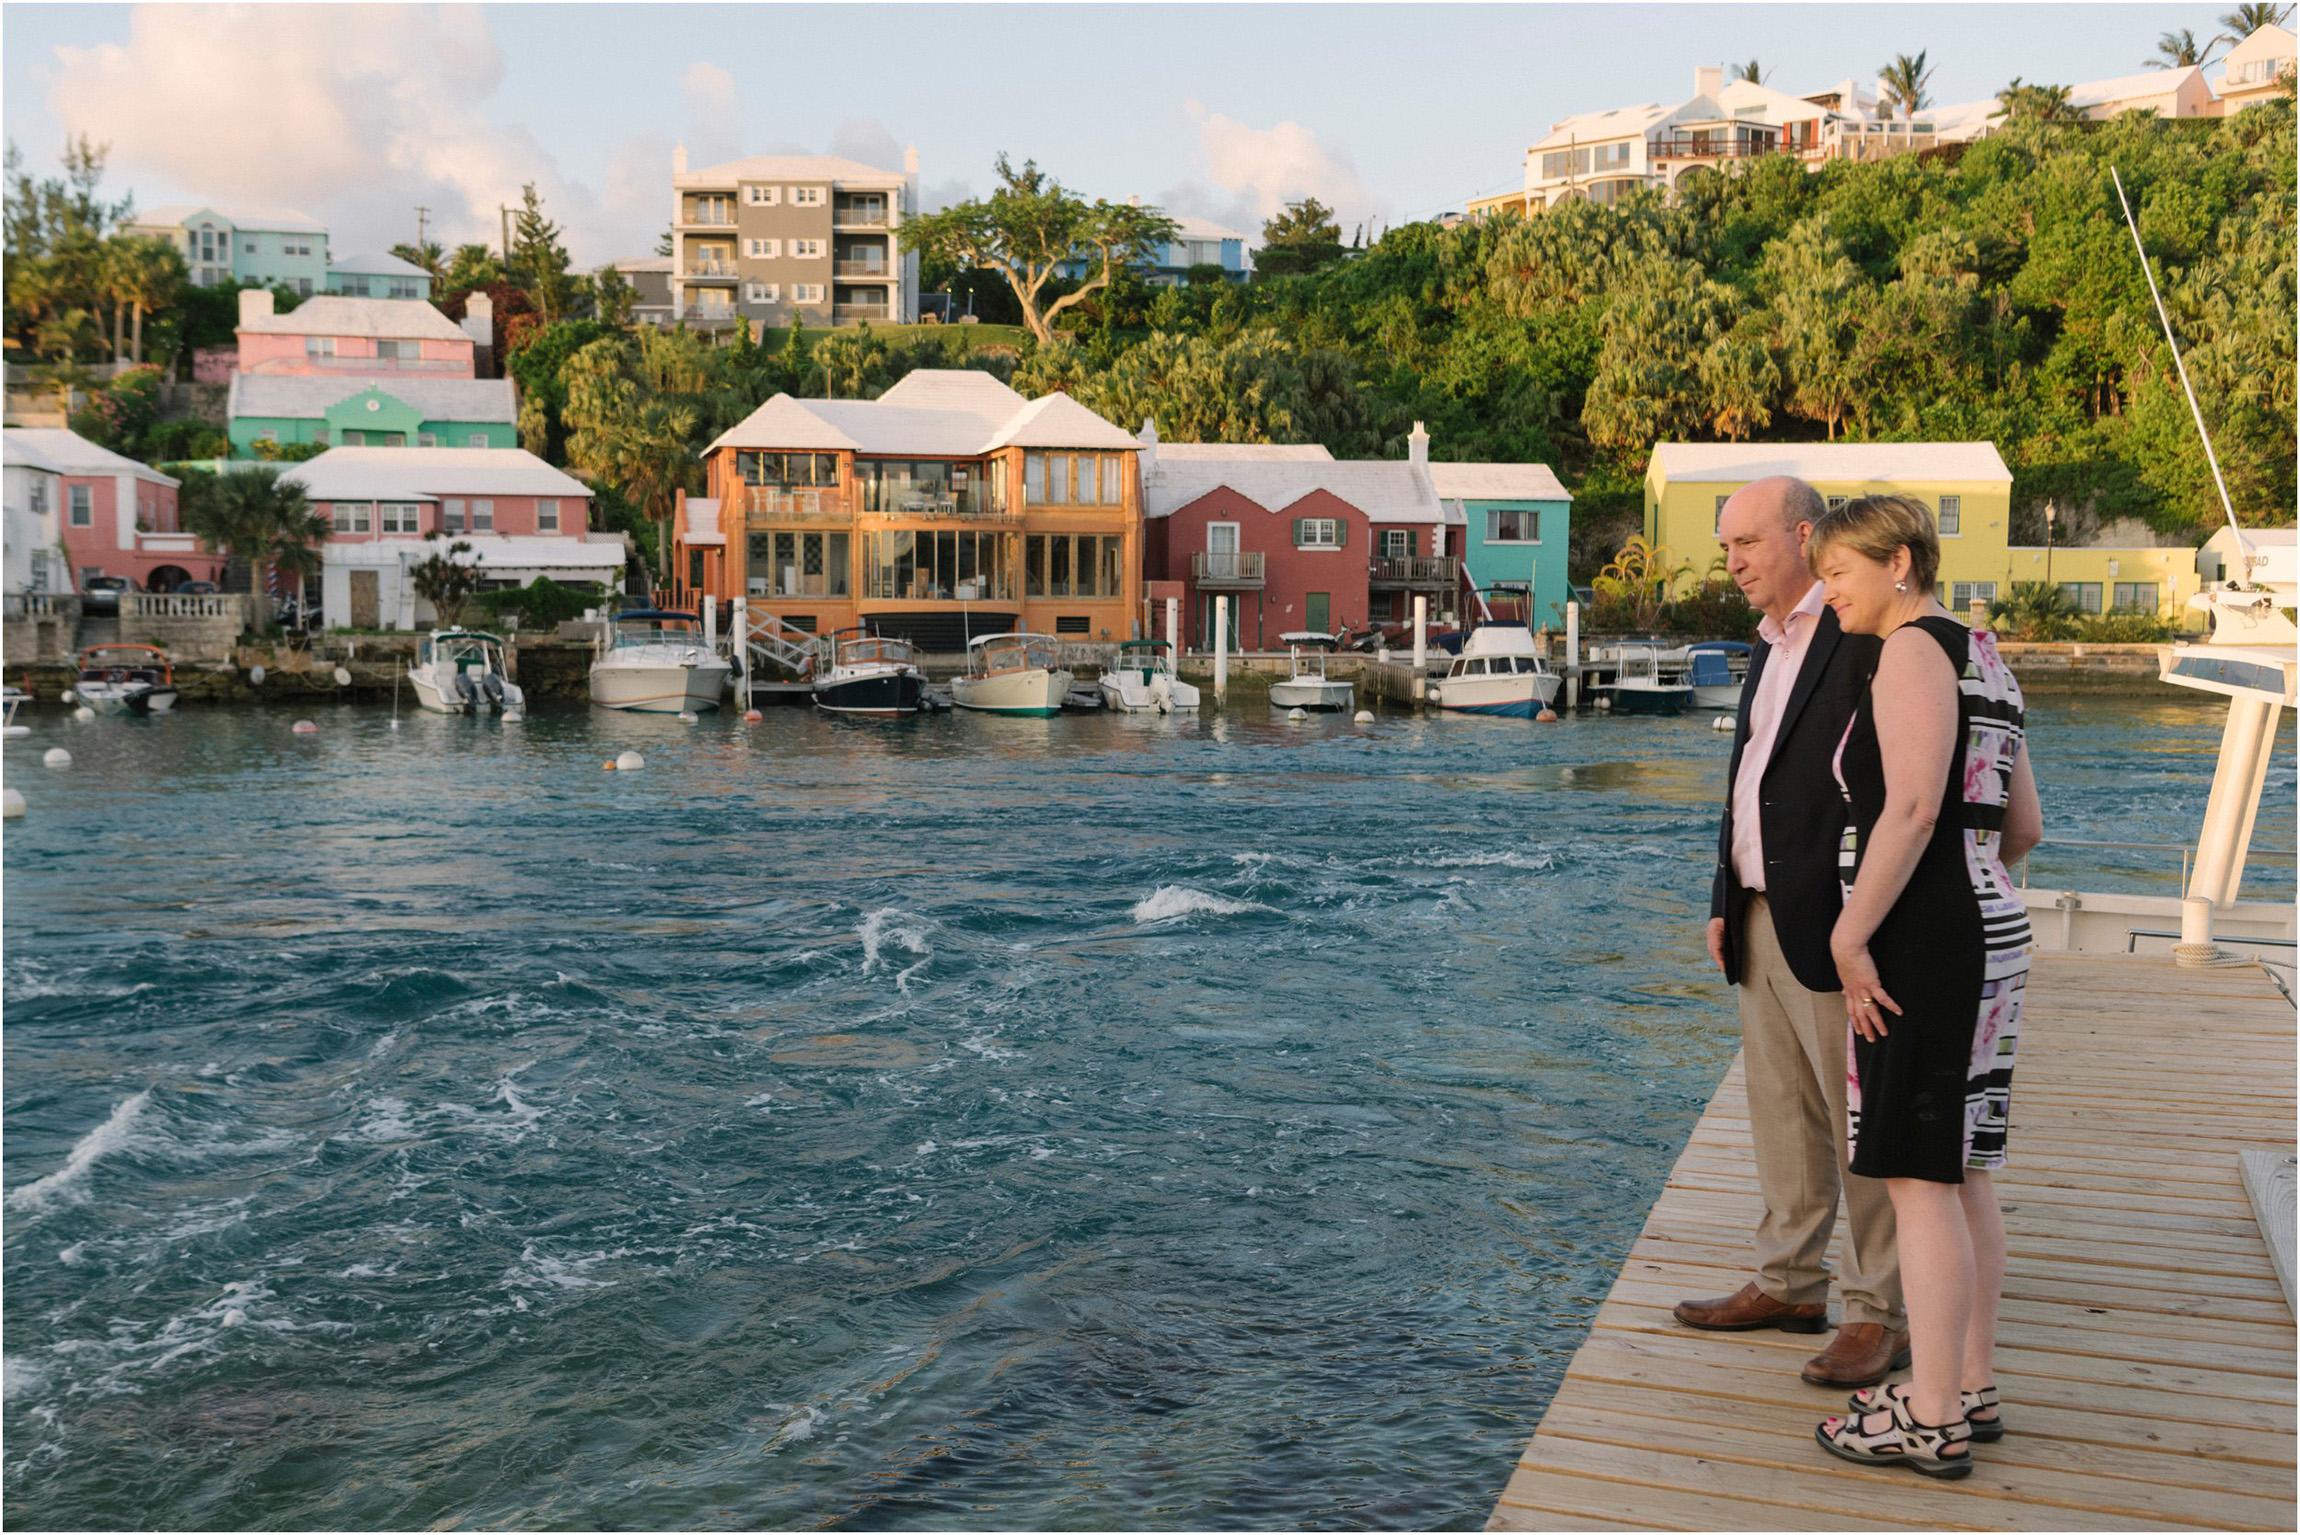 ©FianderFoto_Bermuda Photographer_Flatts Village_Cooper's Island_Andrea_002.jpg